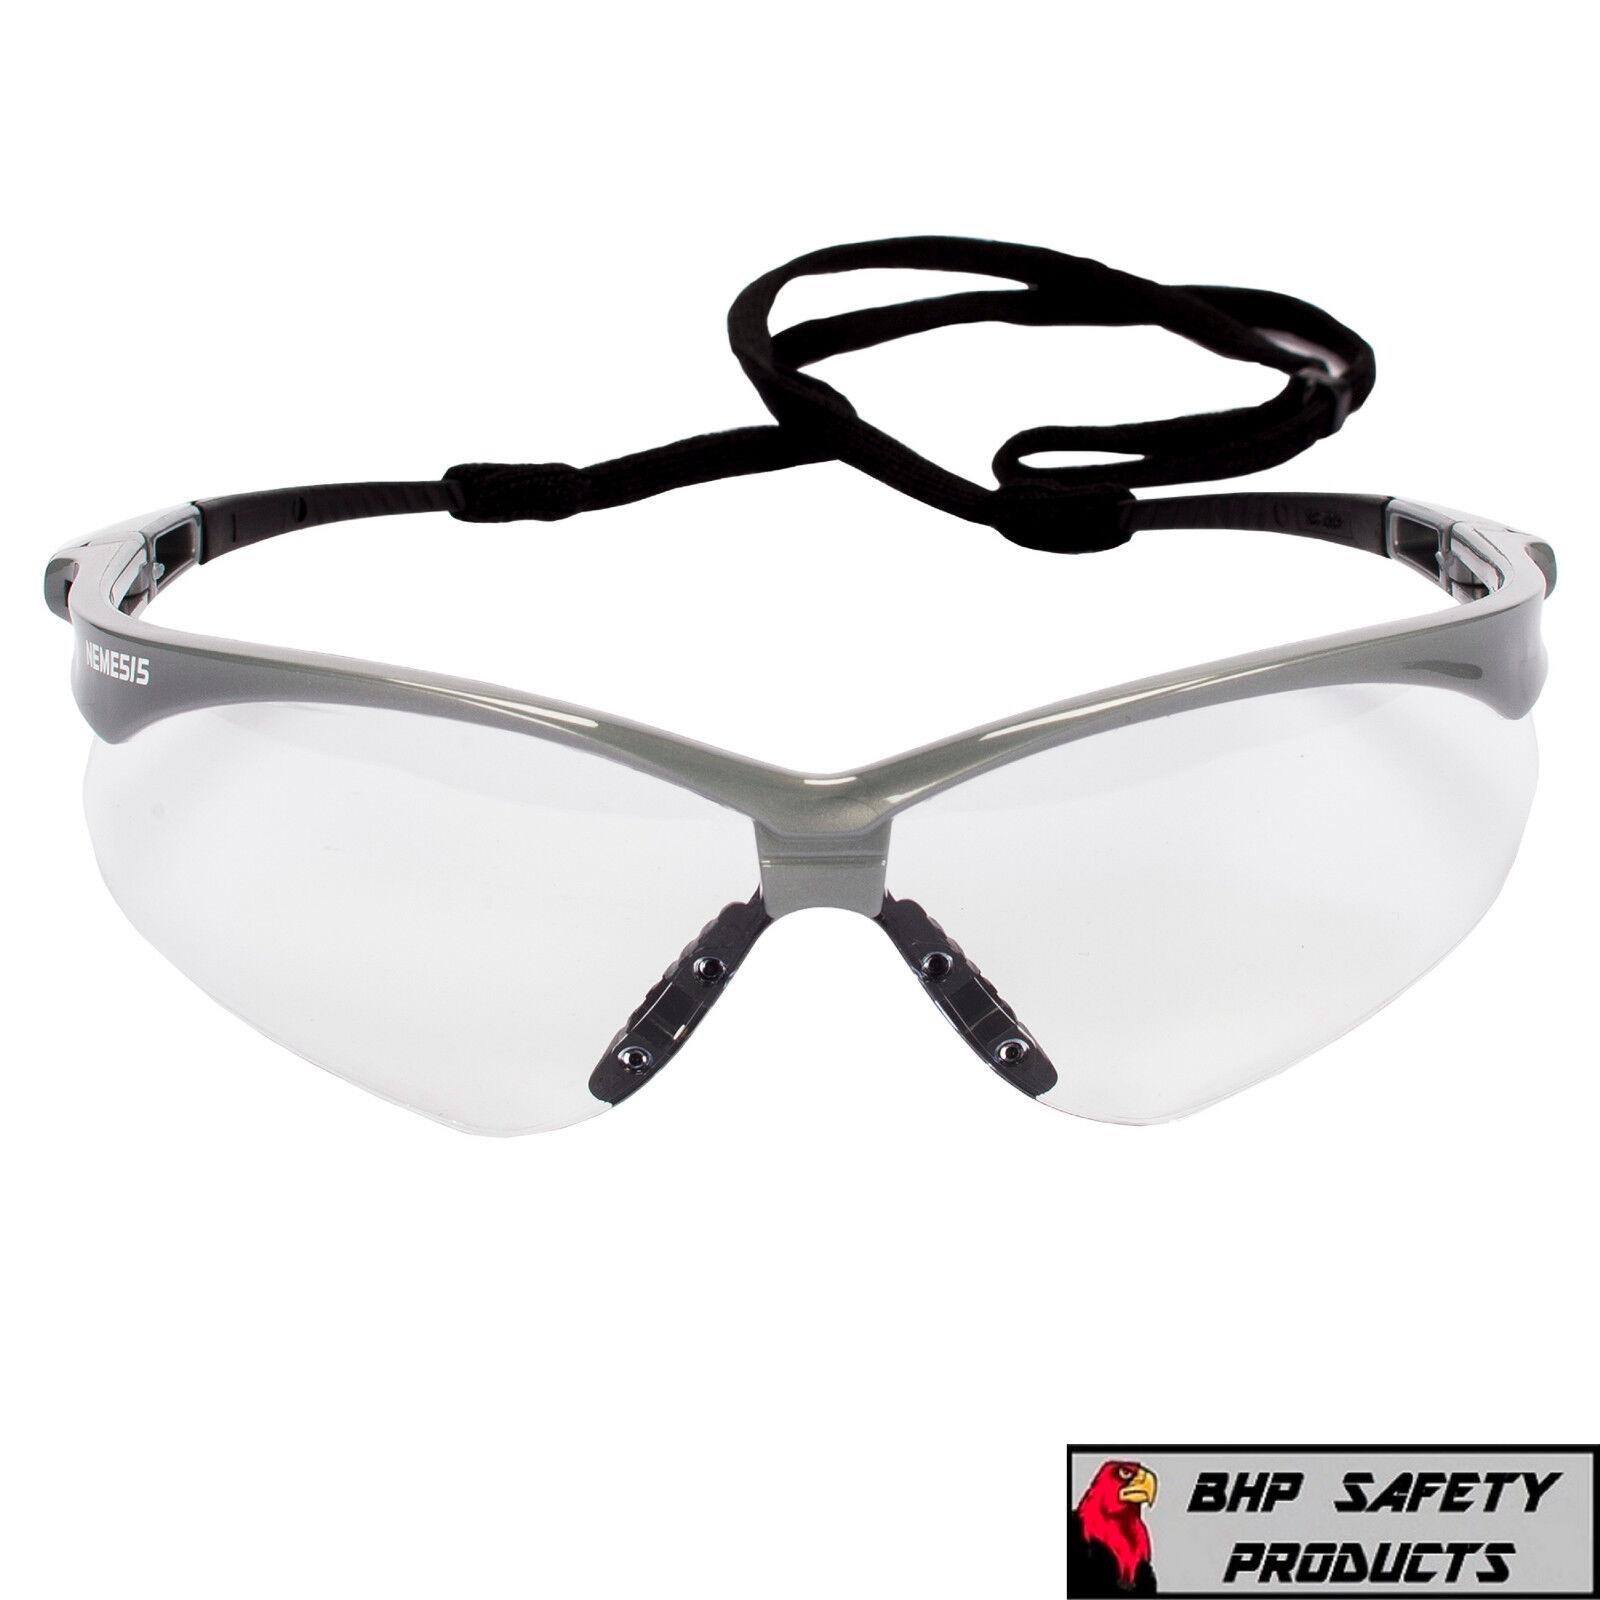 3 PAIR JACKSON NEMESIS 47388 SAFETY GLASSES SILVER//CLEAR ANTI-FOG LENS Z87+